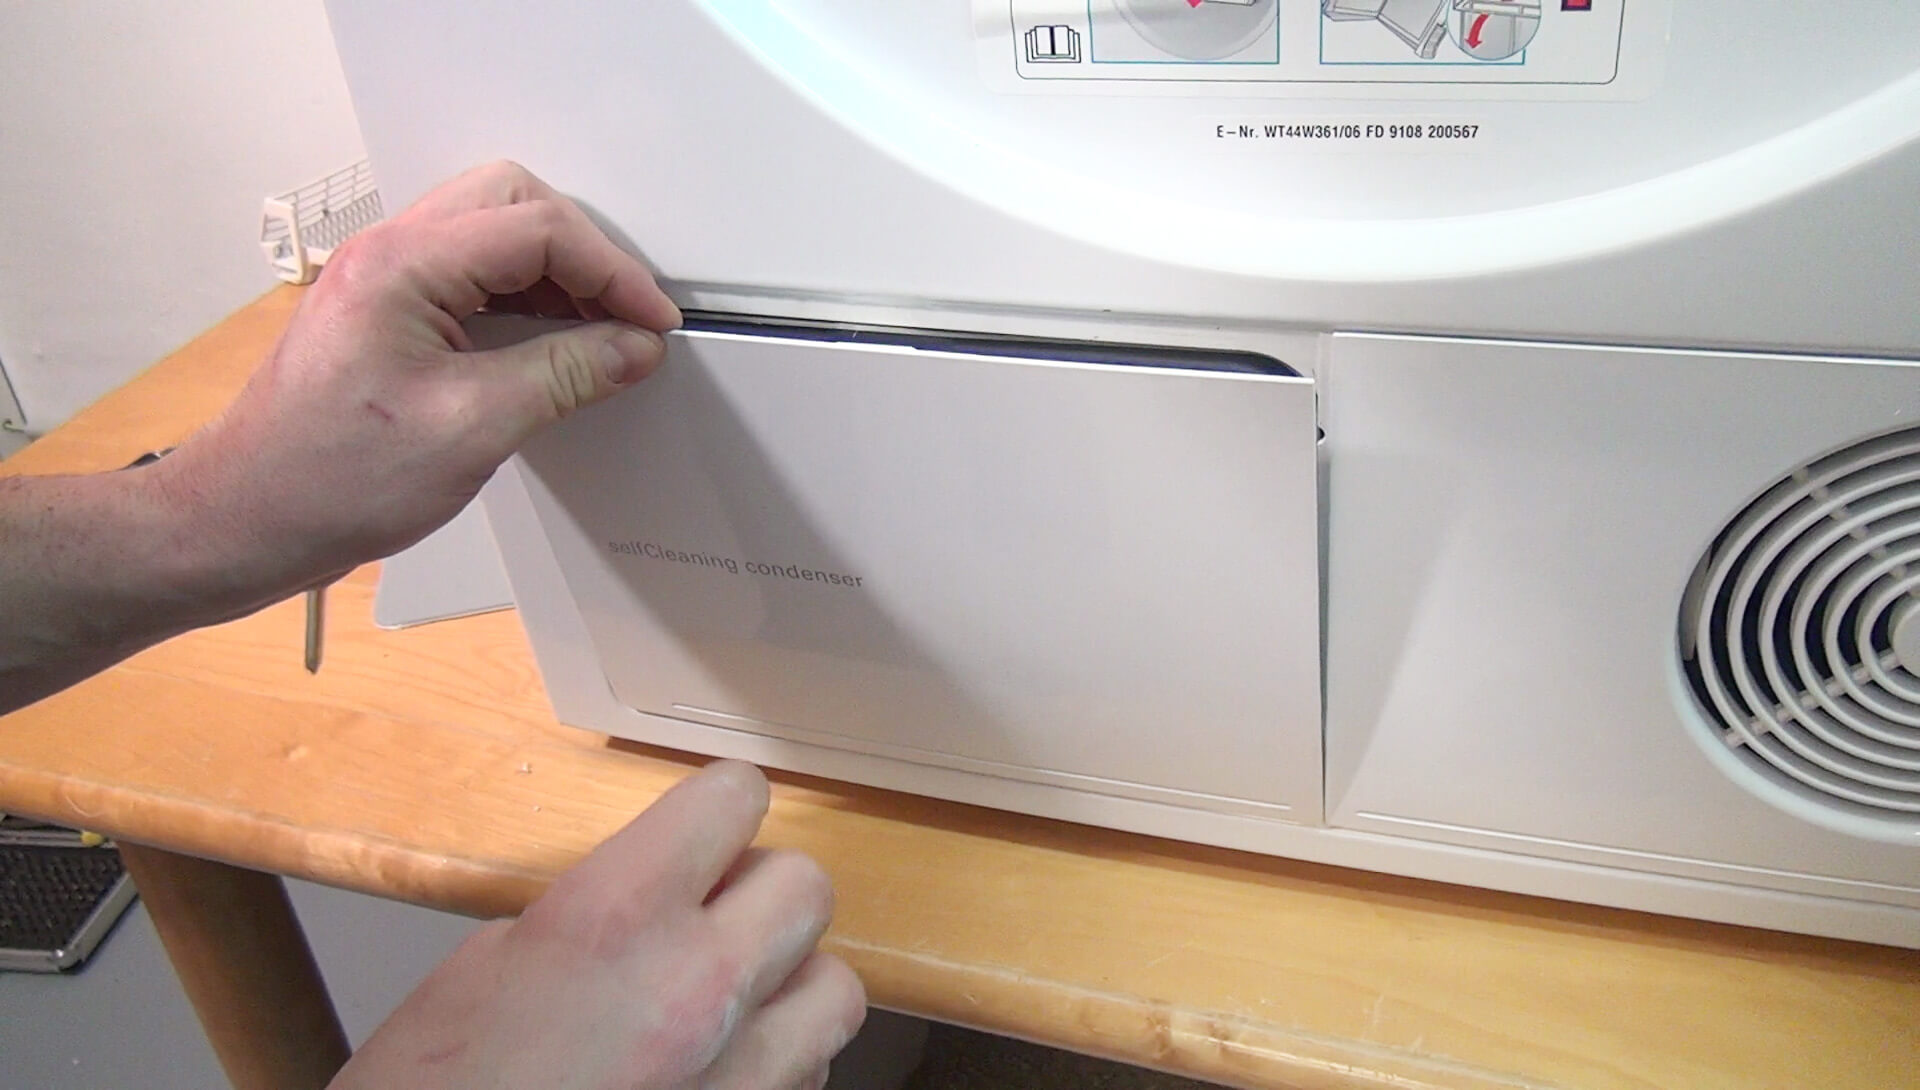 Siemens wt w ch stecker iq wärmepumpentrockner trockner